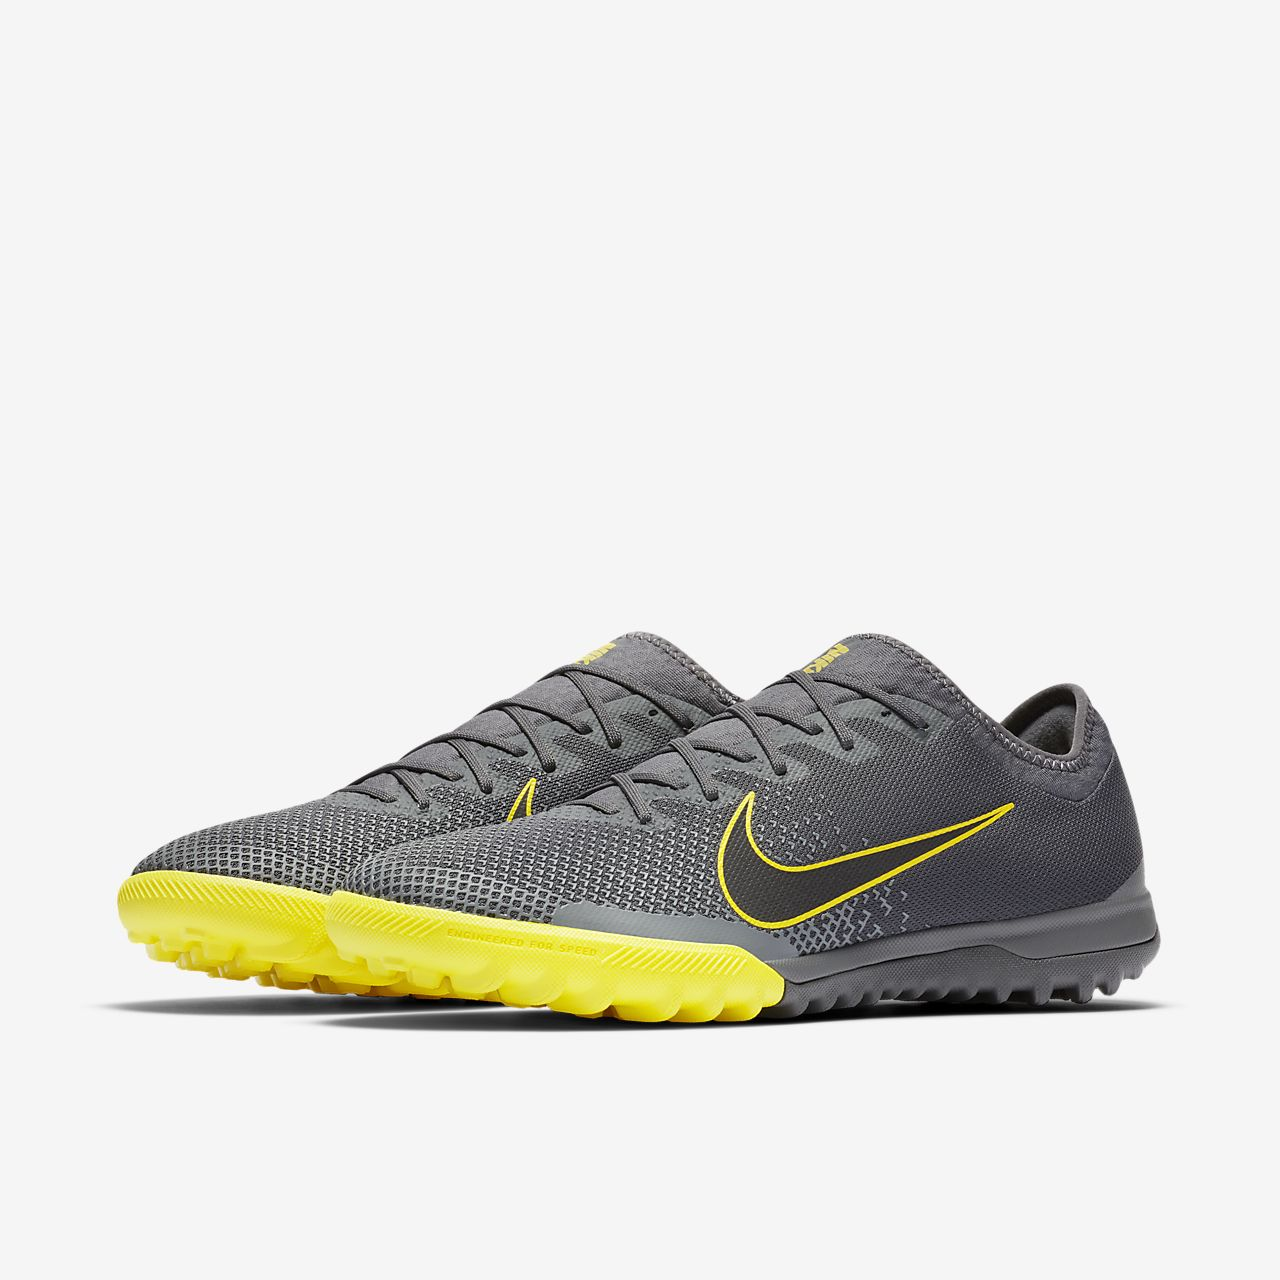 23eb152c5 Nike MercurialX Vapor XII Pro TF Turf Football Shoe. Nike.com NO